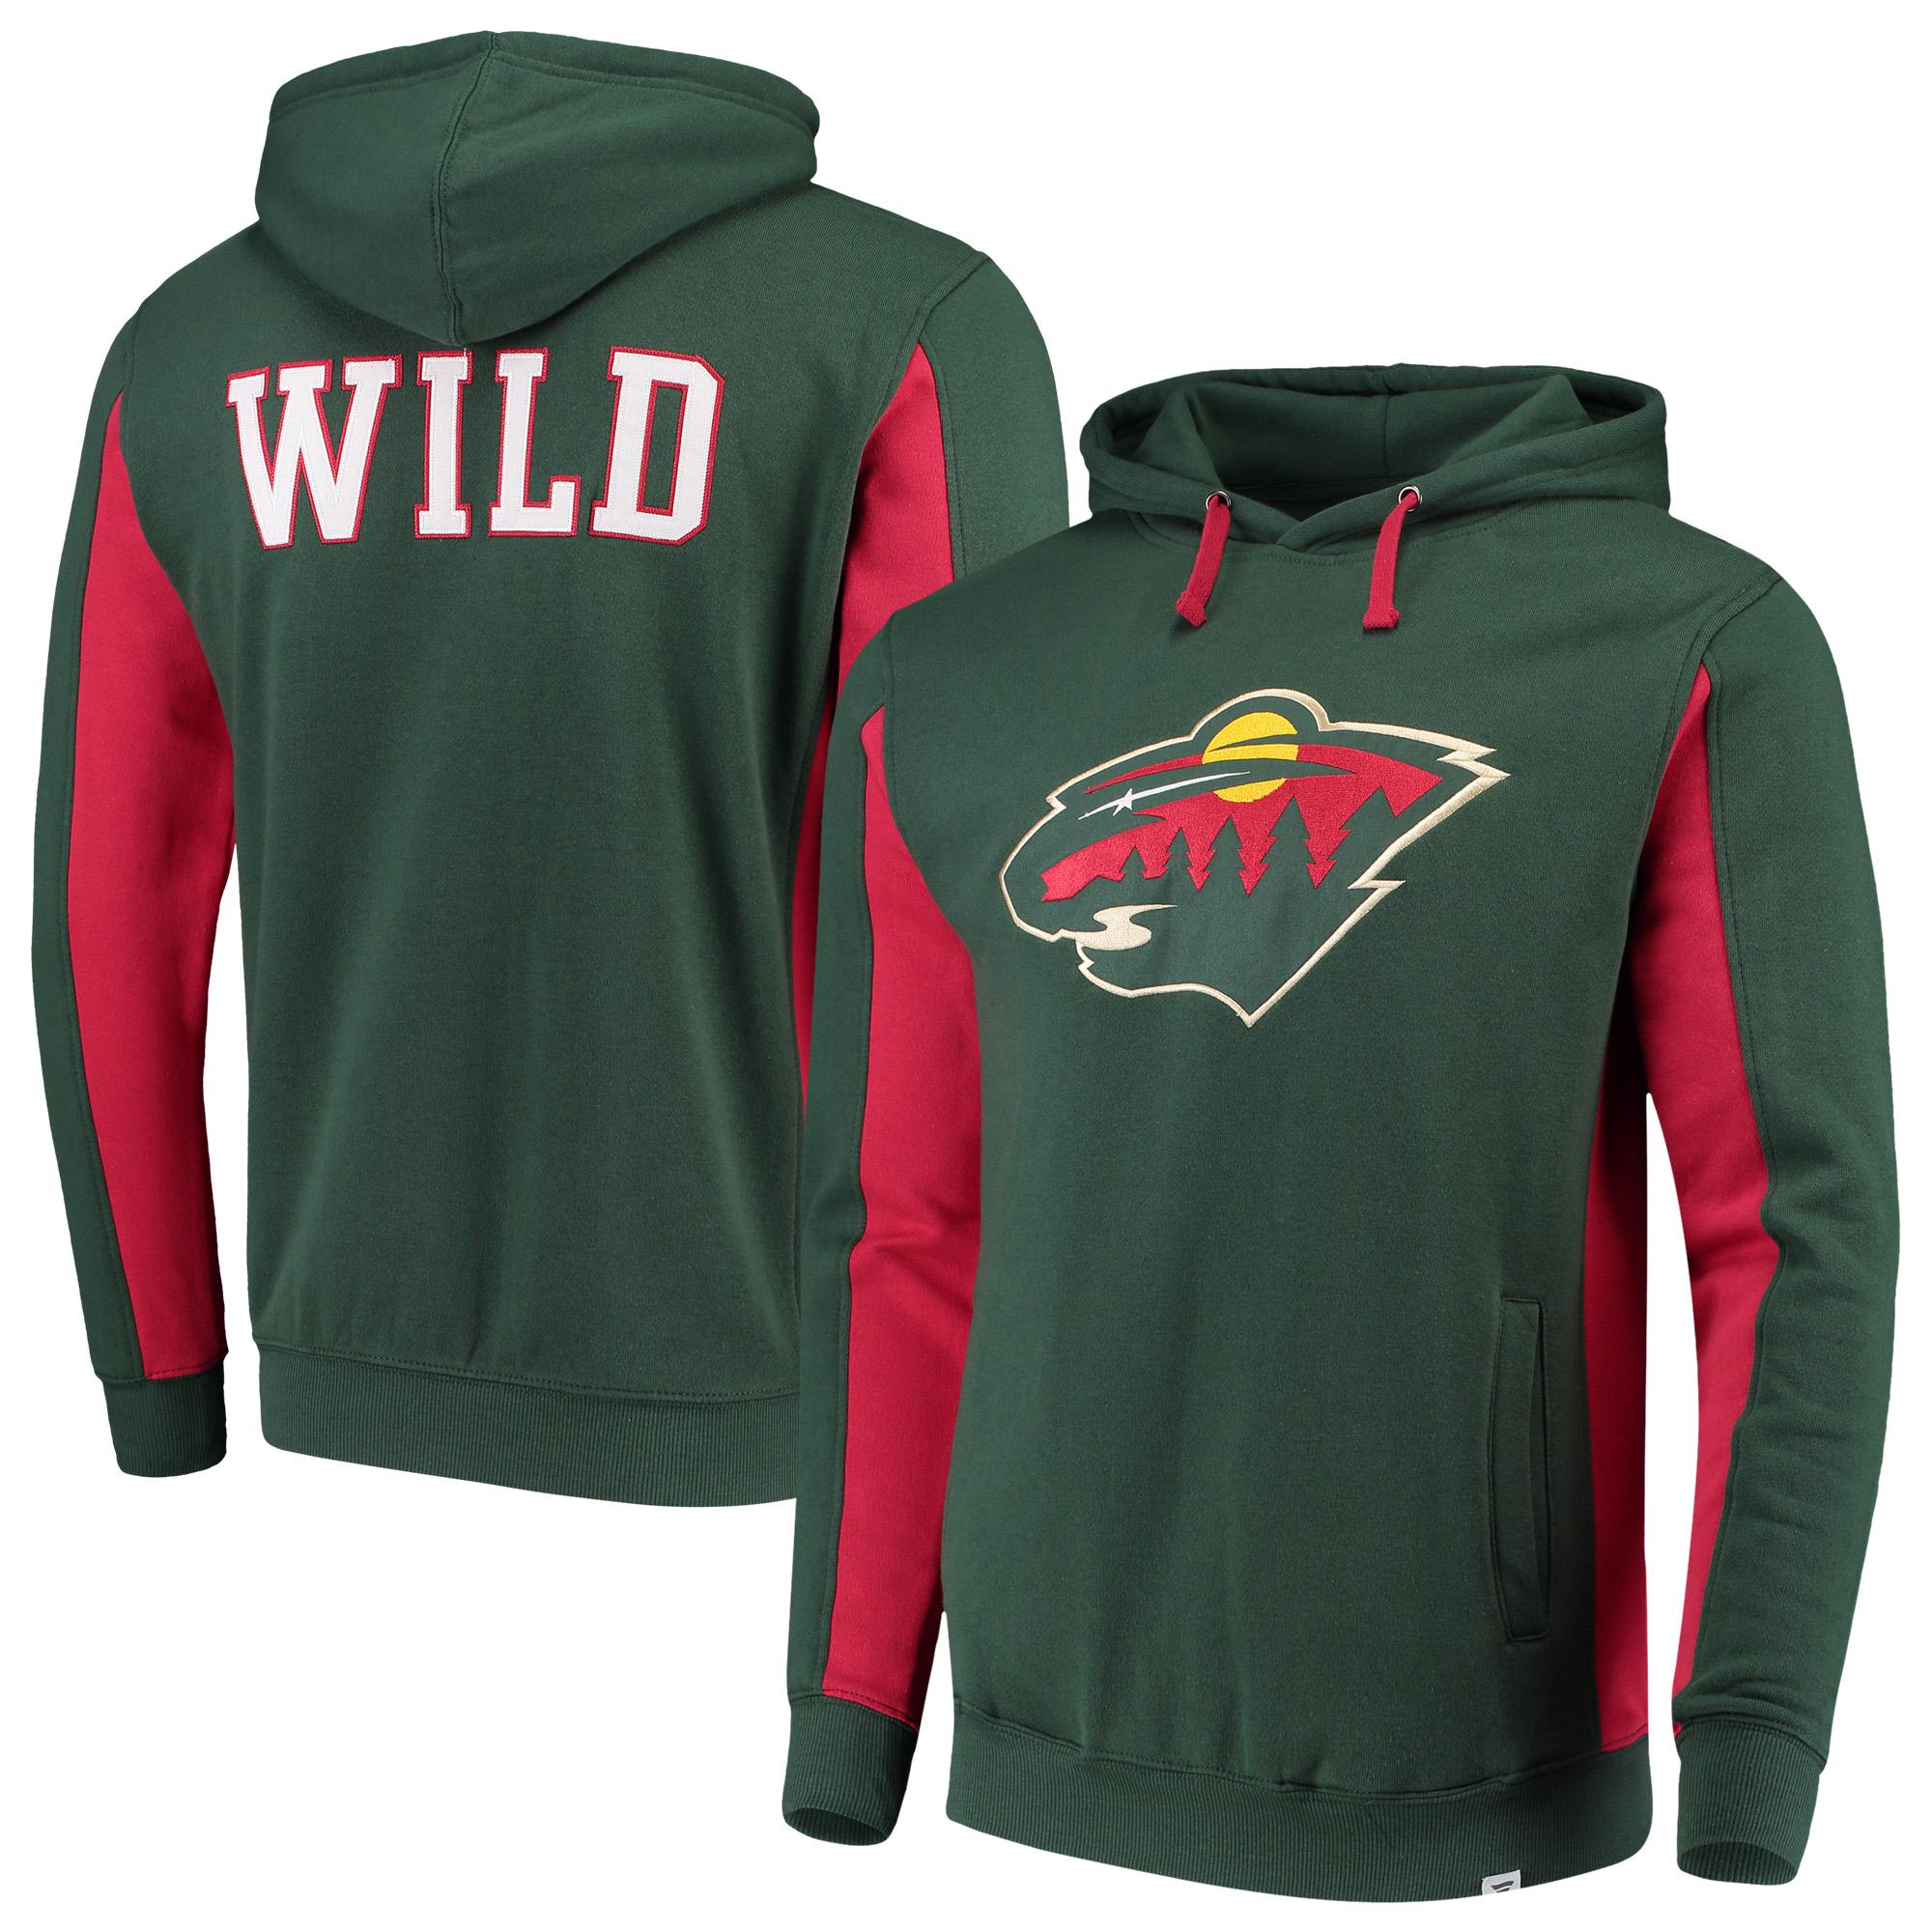 Minnesota Wild Fanatics Branded Colorblock Pullover Hoodie - Green/Red